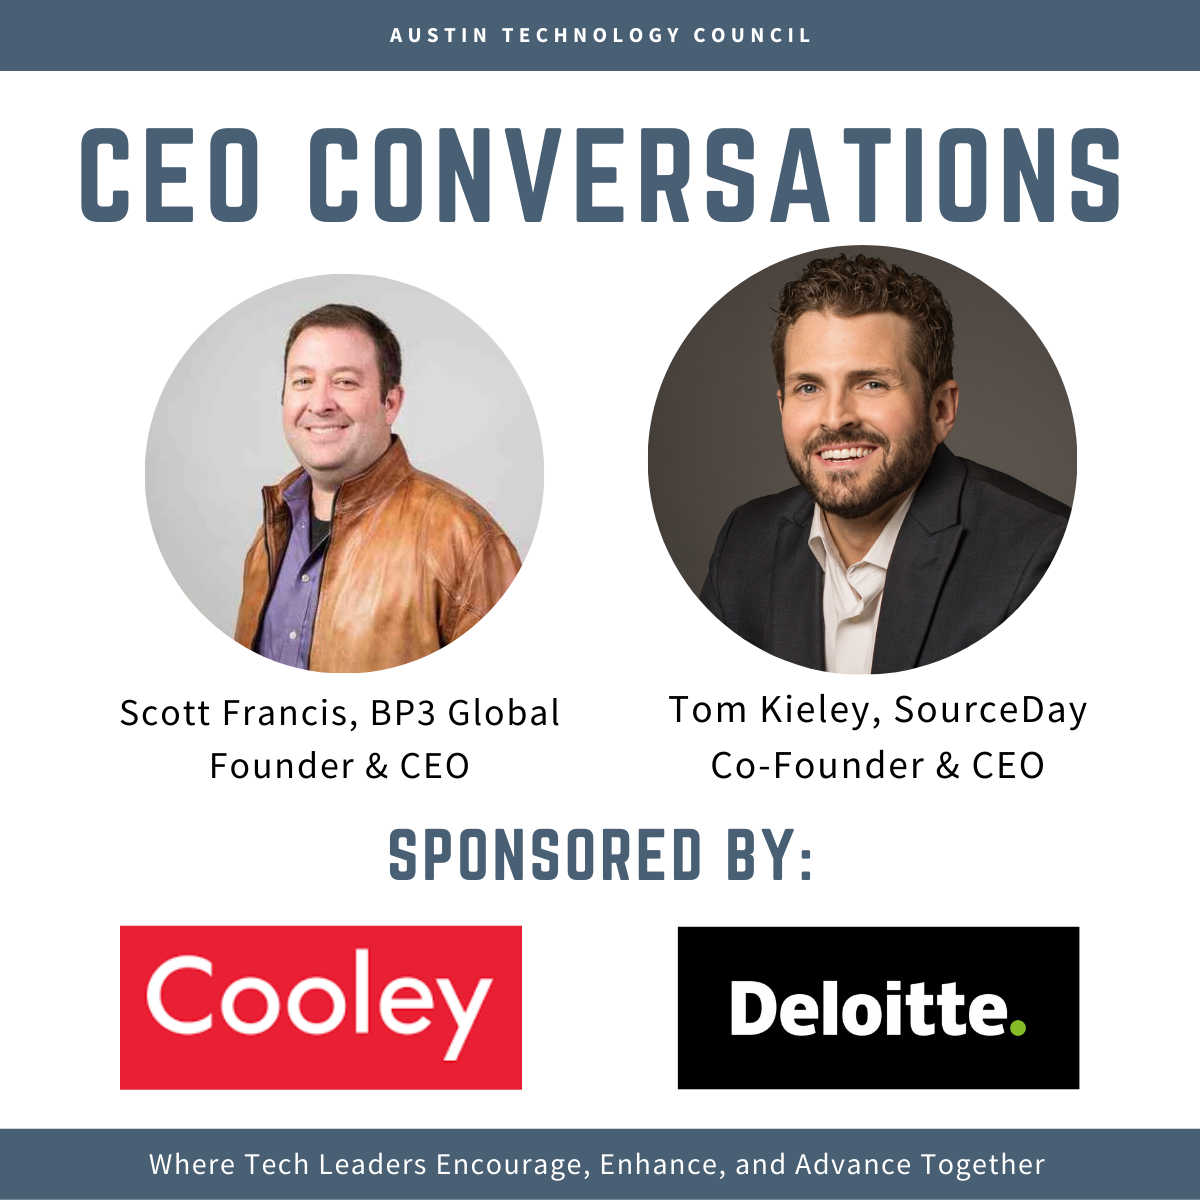 CEO Conversations with Scott Francis & Tom Kieley